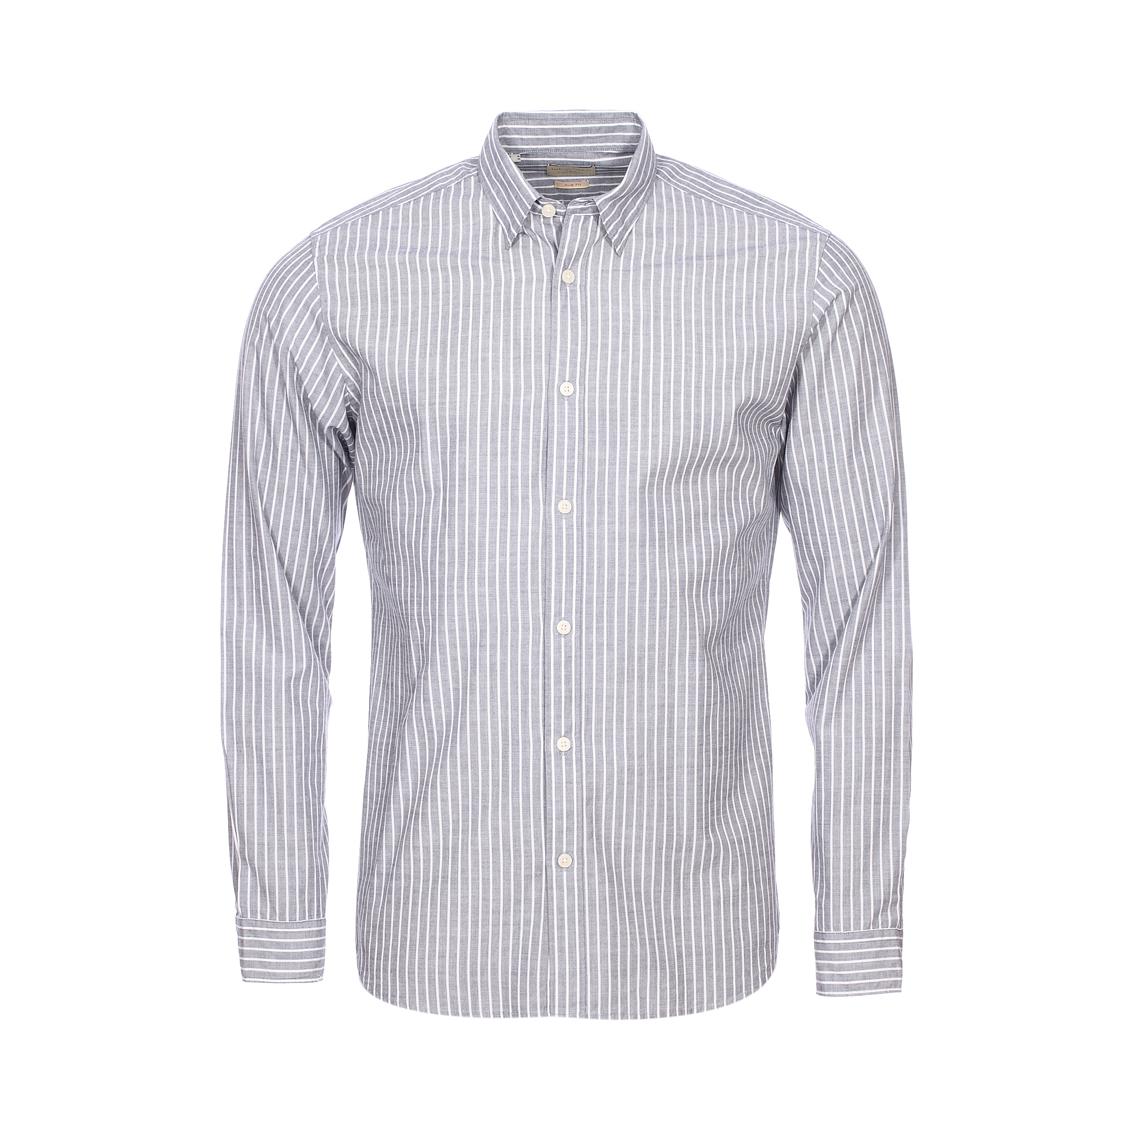 Chemise cintrée  en coton bleu indigo à rayures blanches